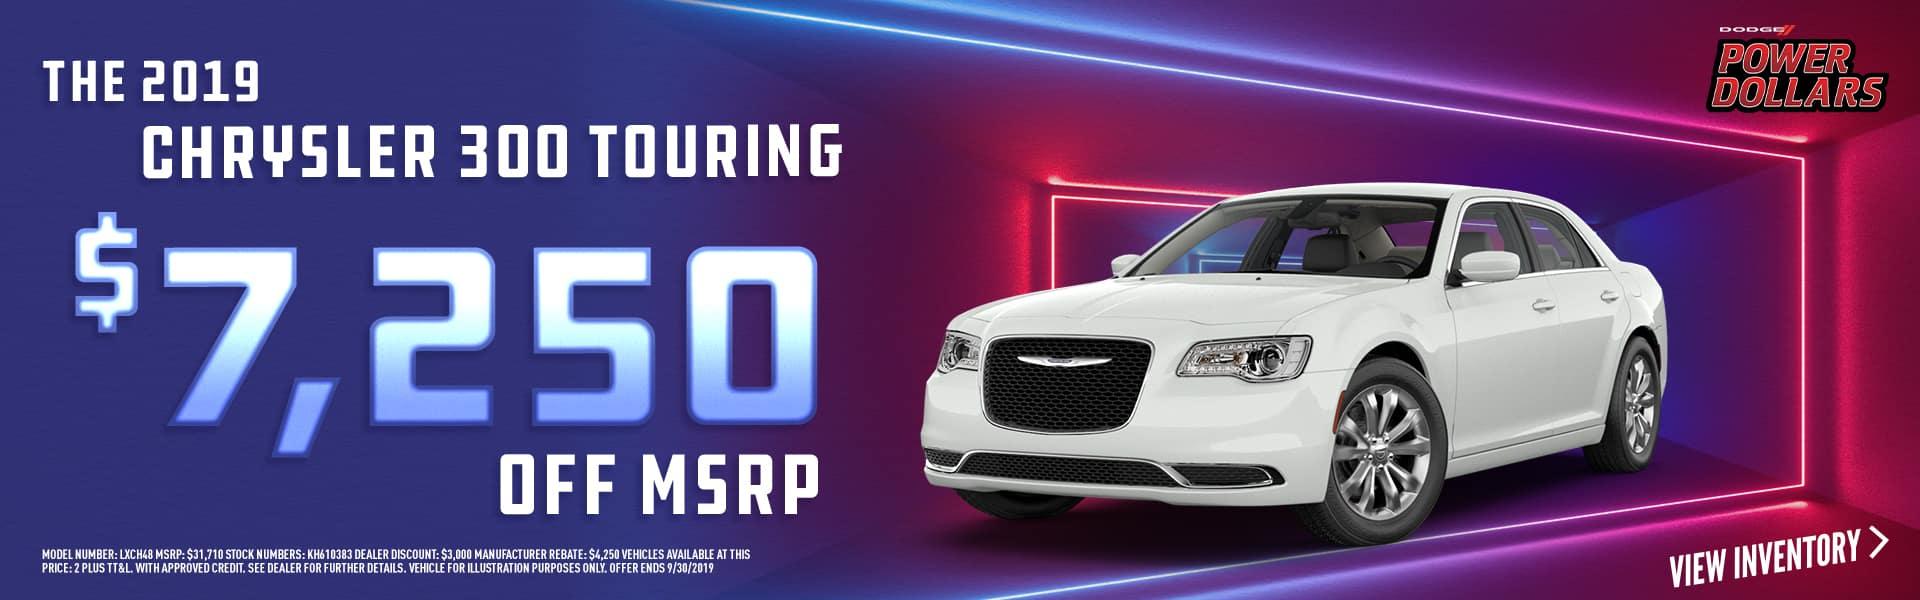 Mike_Smith_CJDR_Chrysler_300_Touring